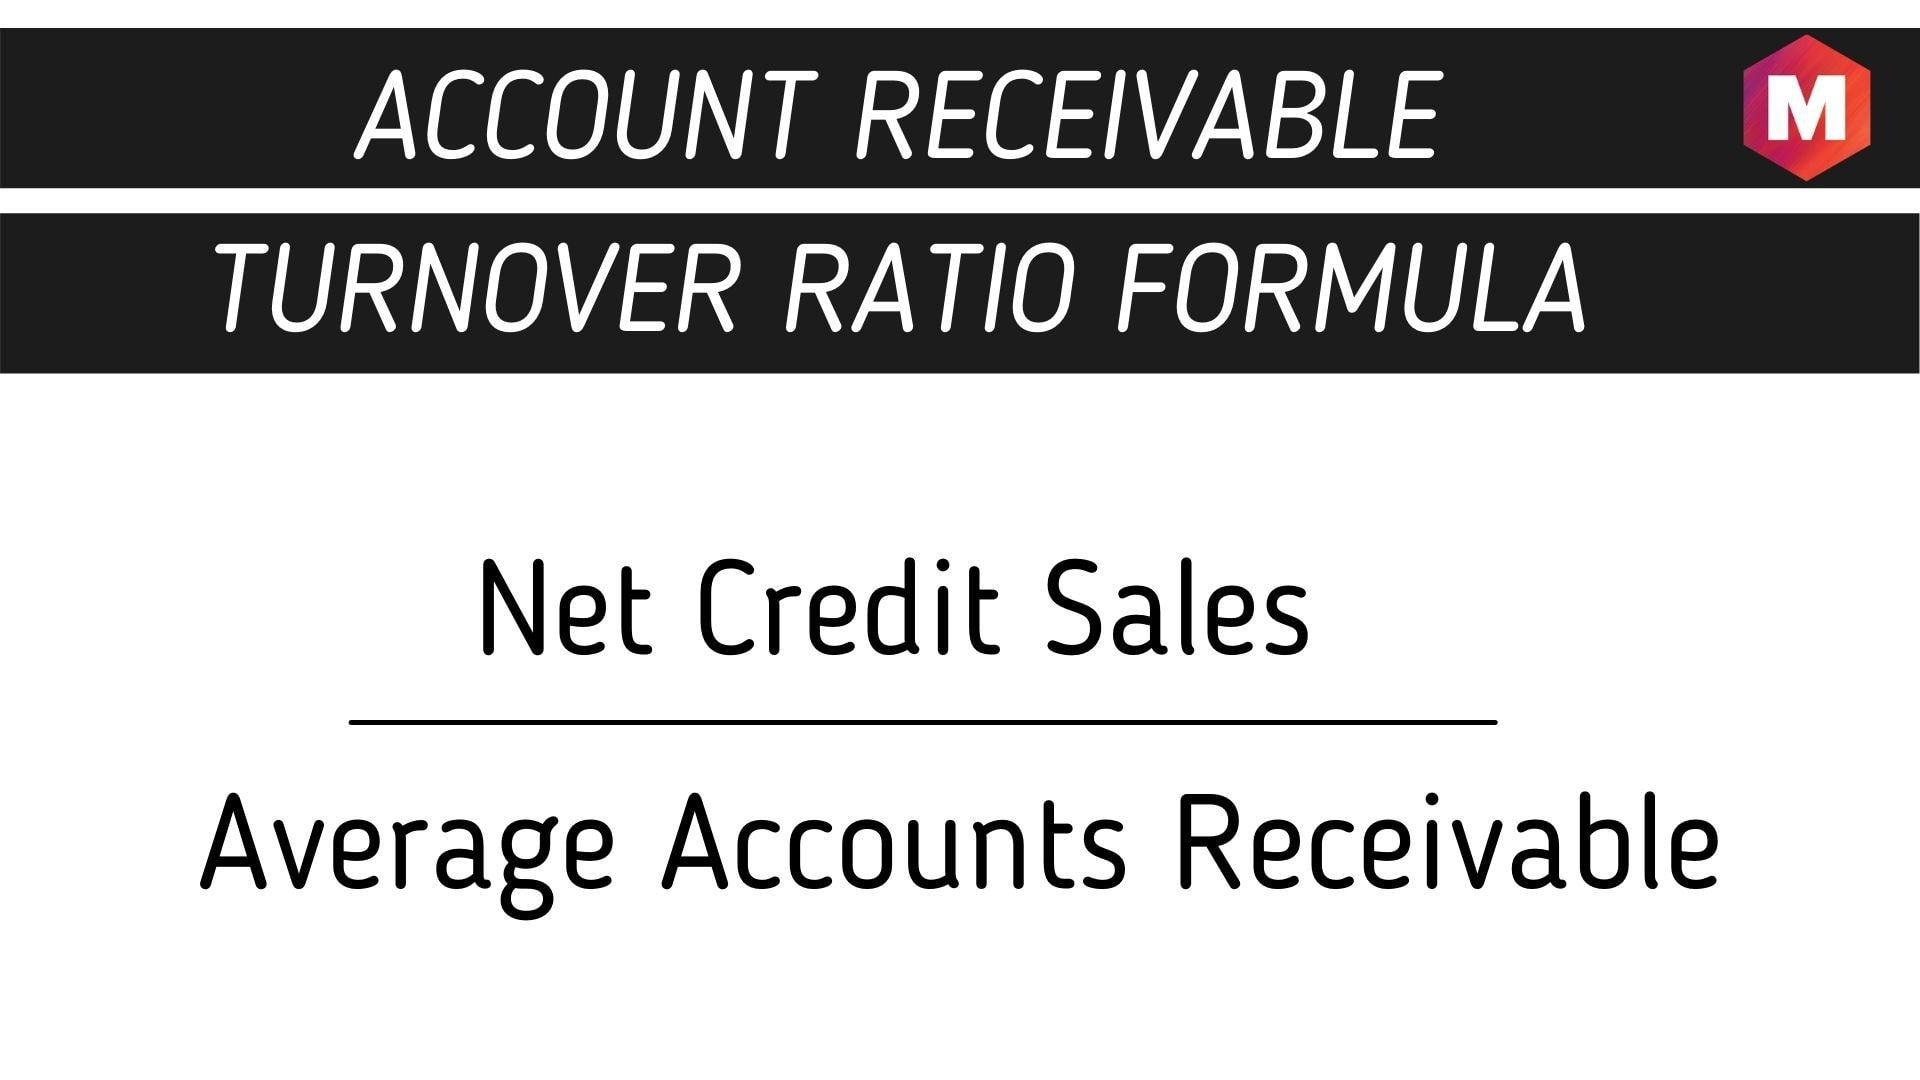 Account Receivable Turnover Ratio Formula